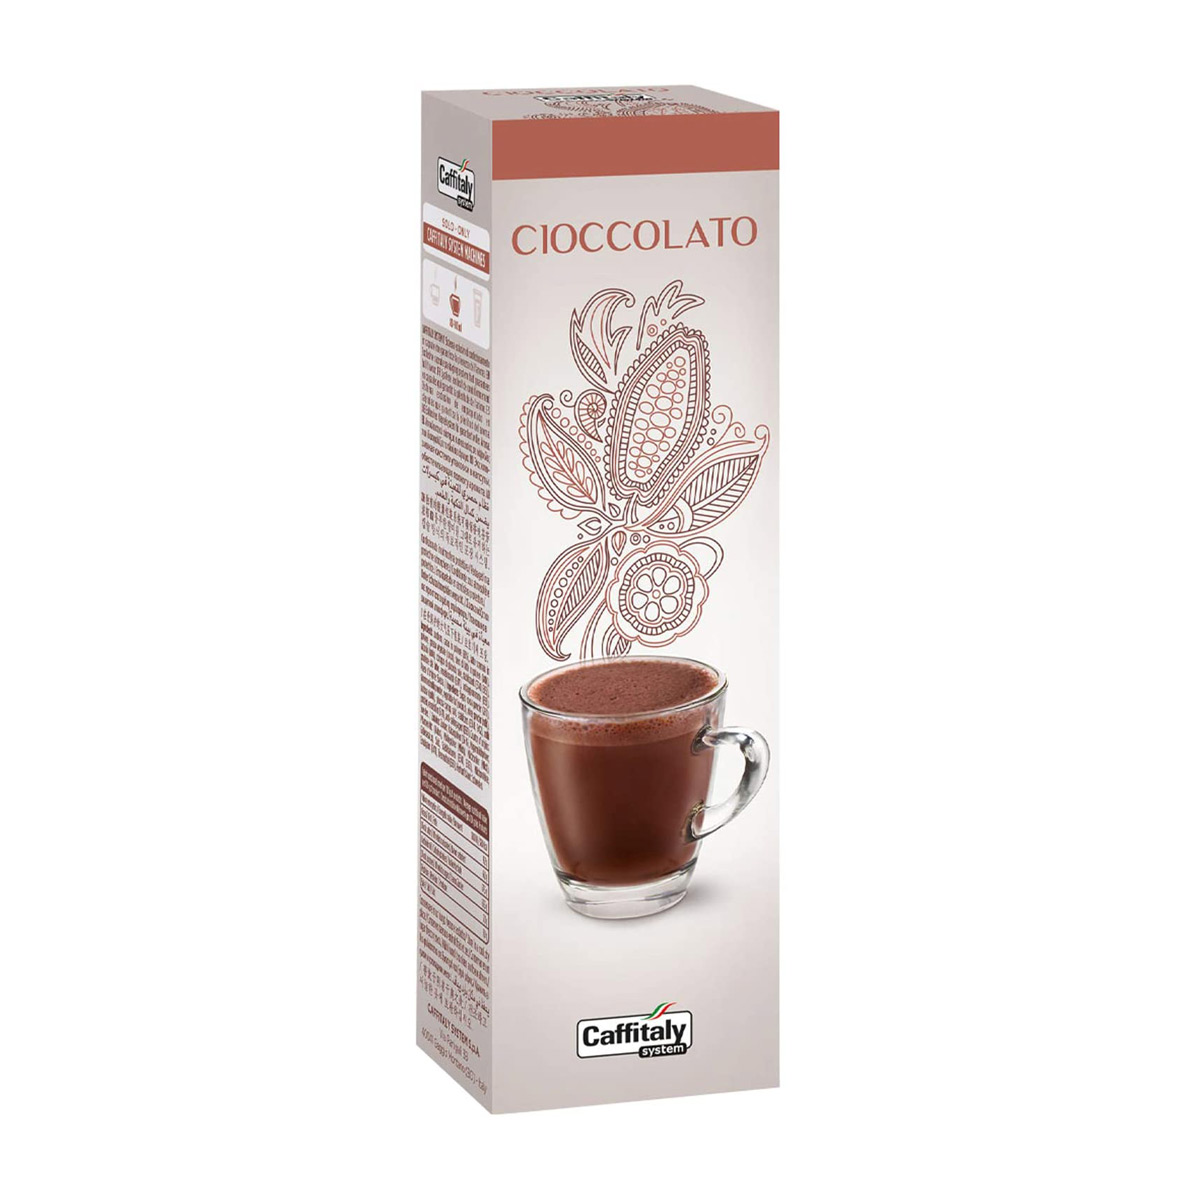 Caffitaly Hot Chocolate / Bevanda al Cacao Capsules - Box of 10